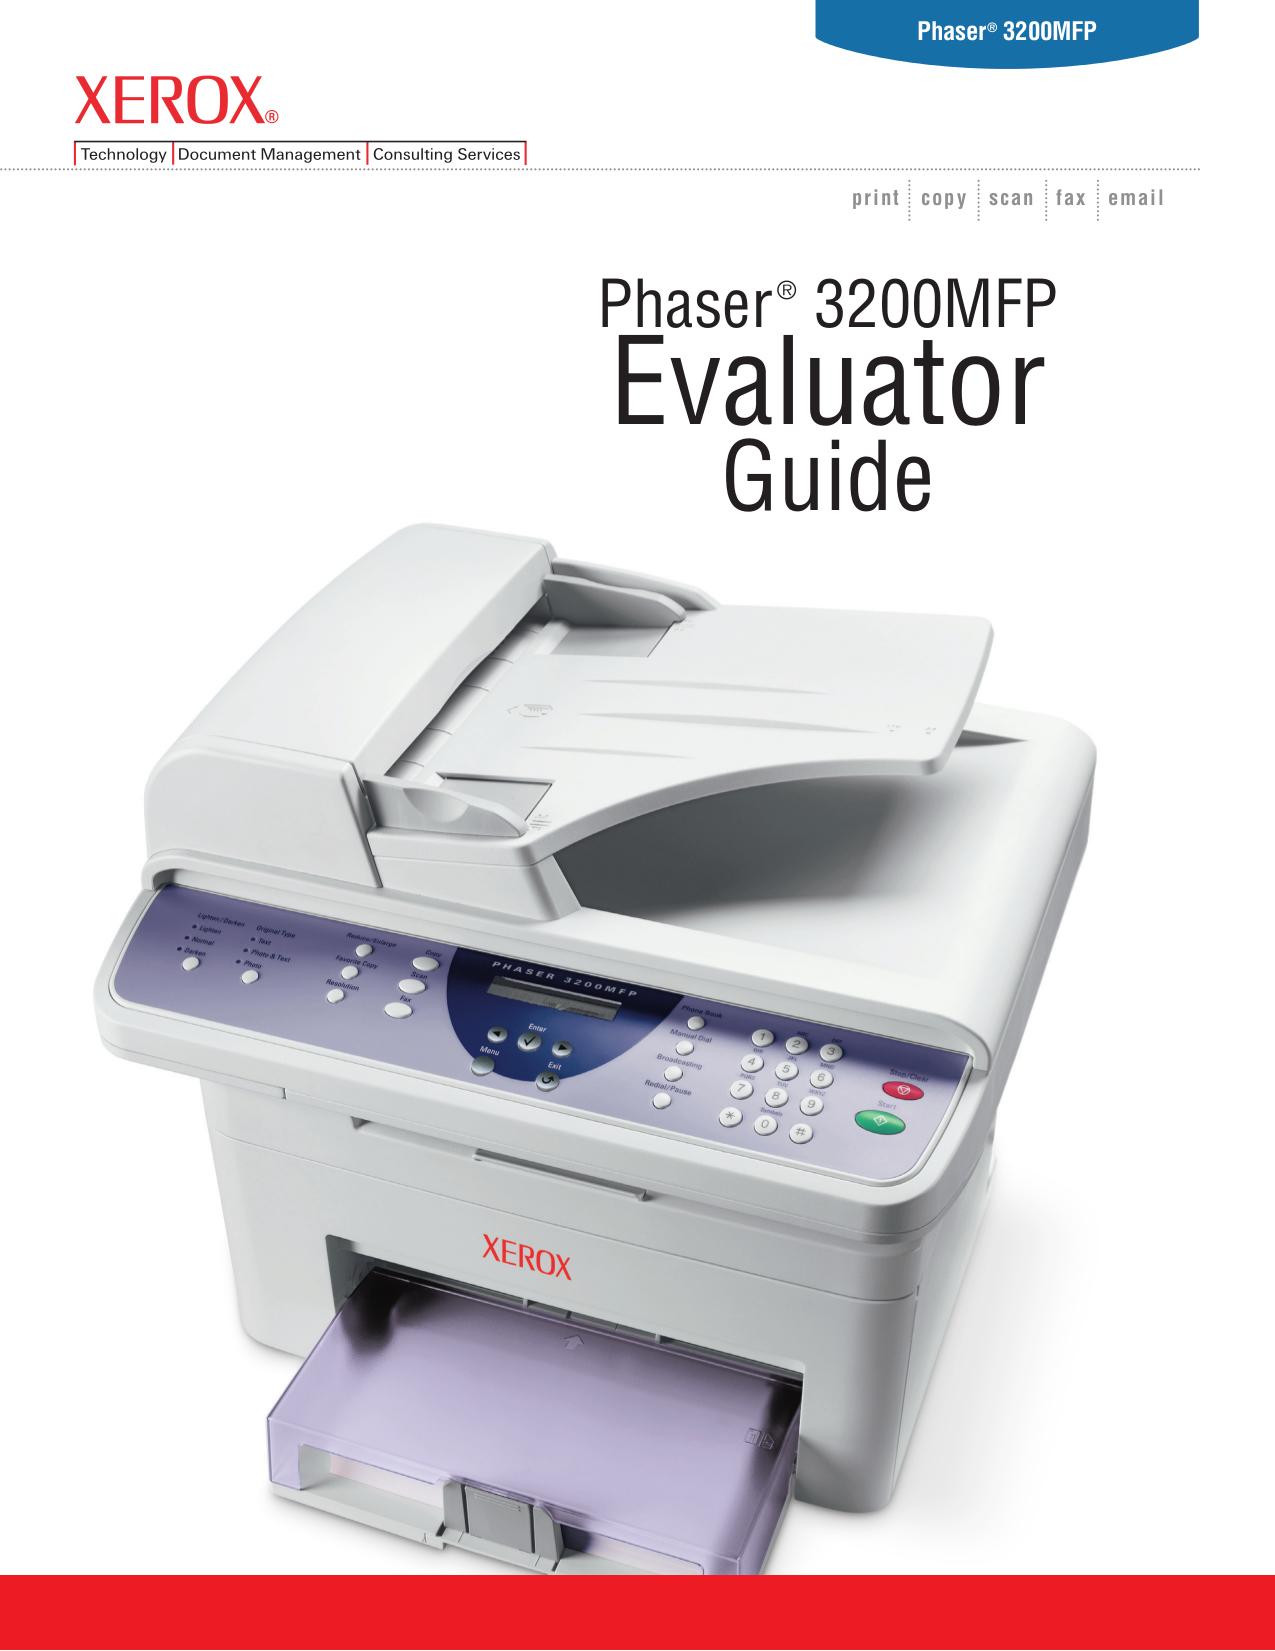 download free pdf for xerox phaser 3200mfp multifunction printer manual rh umlib com xerox phaser 3200 mfp troubleshooting xerox phaser 3200 mfp troubleshooting